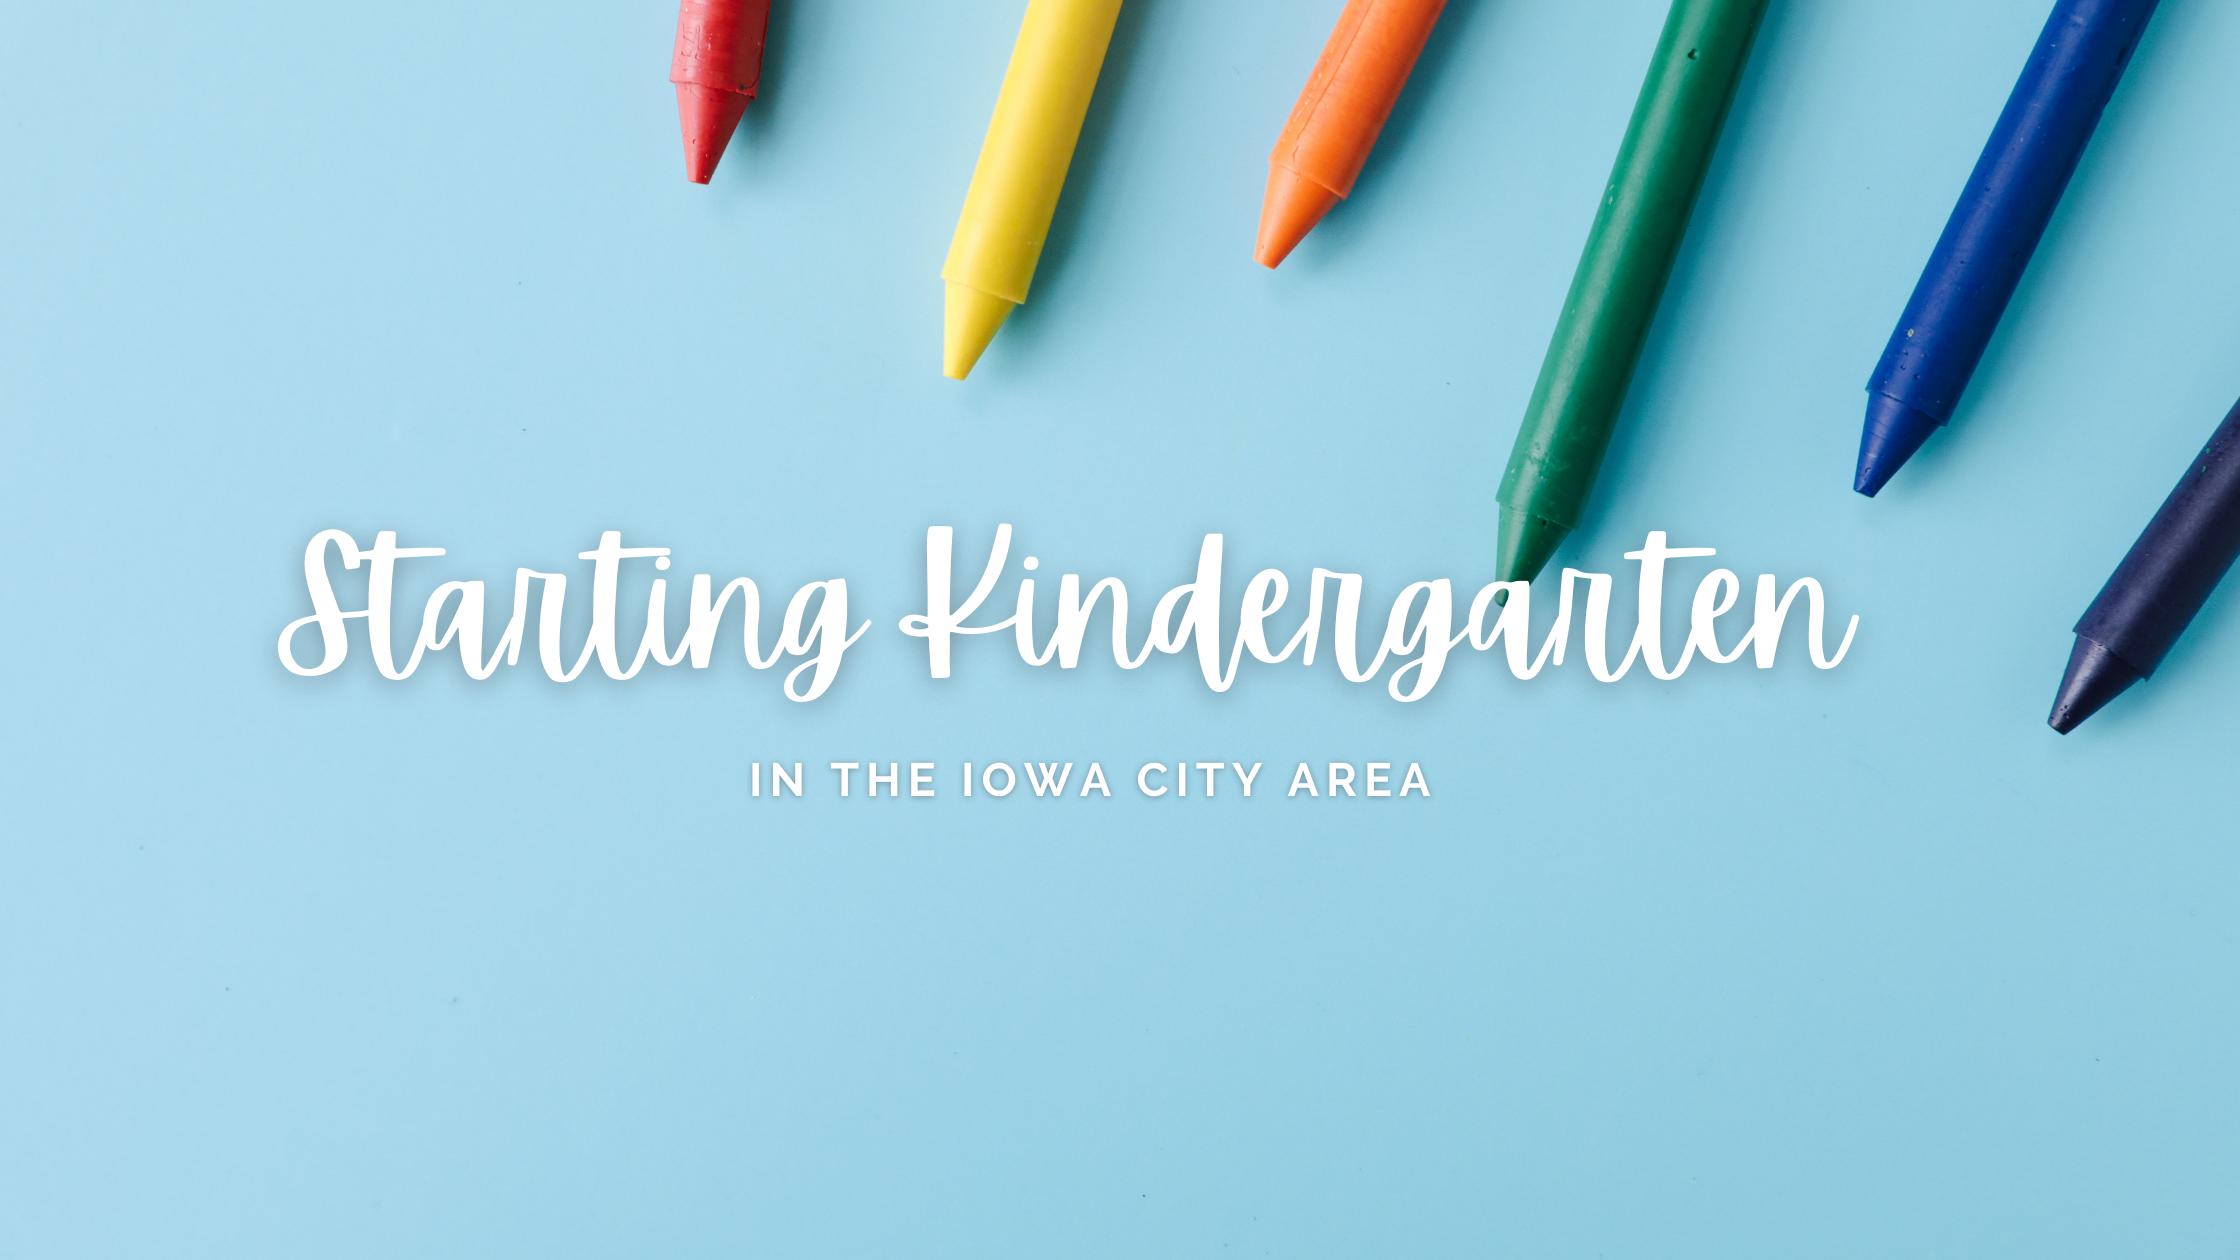 Kindergarten in the Iowa City area